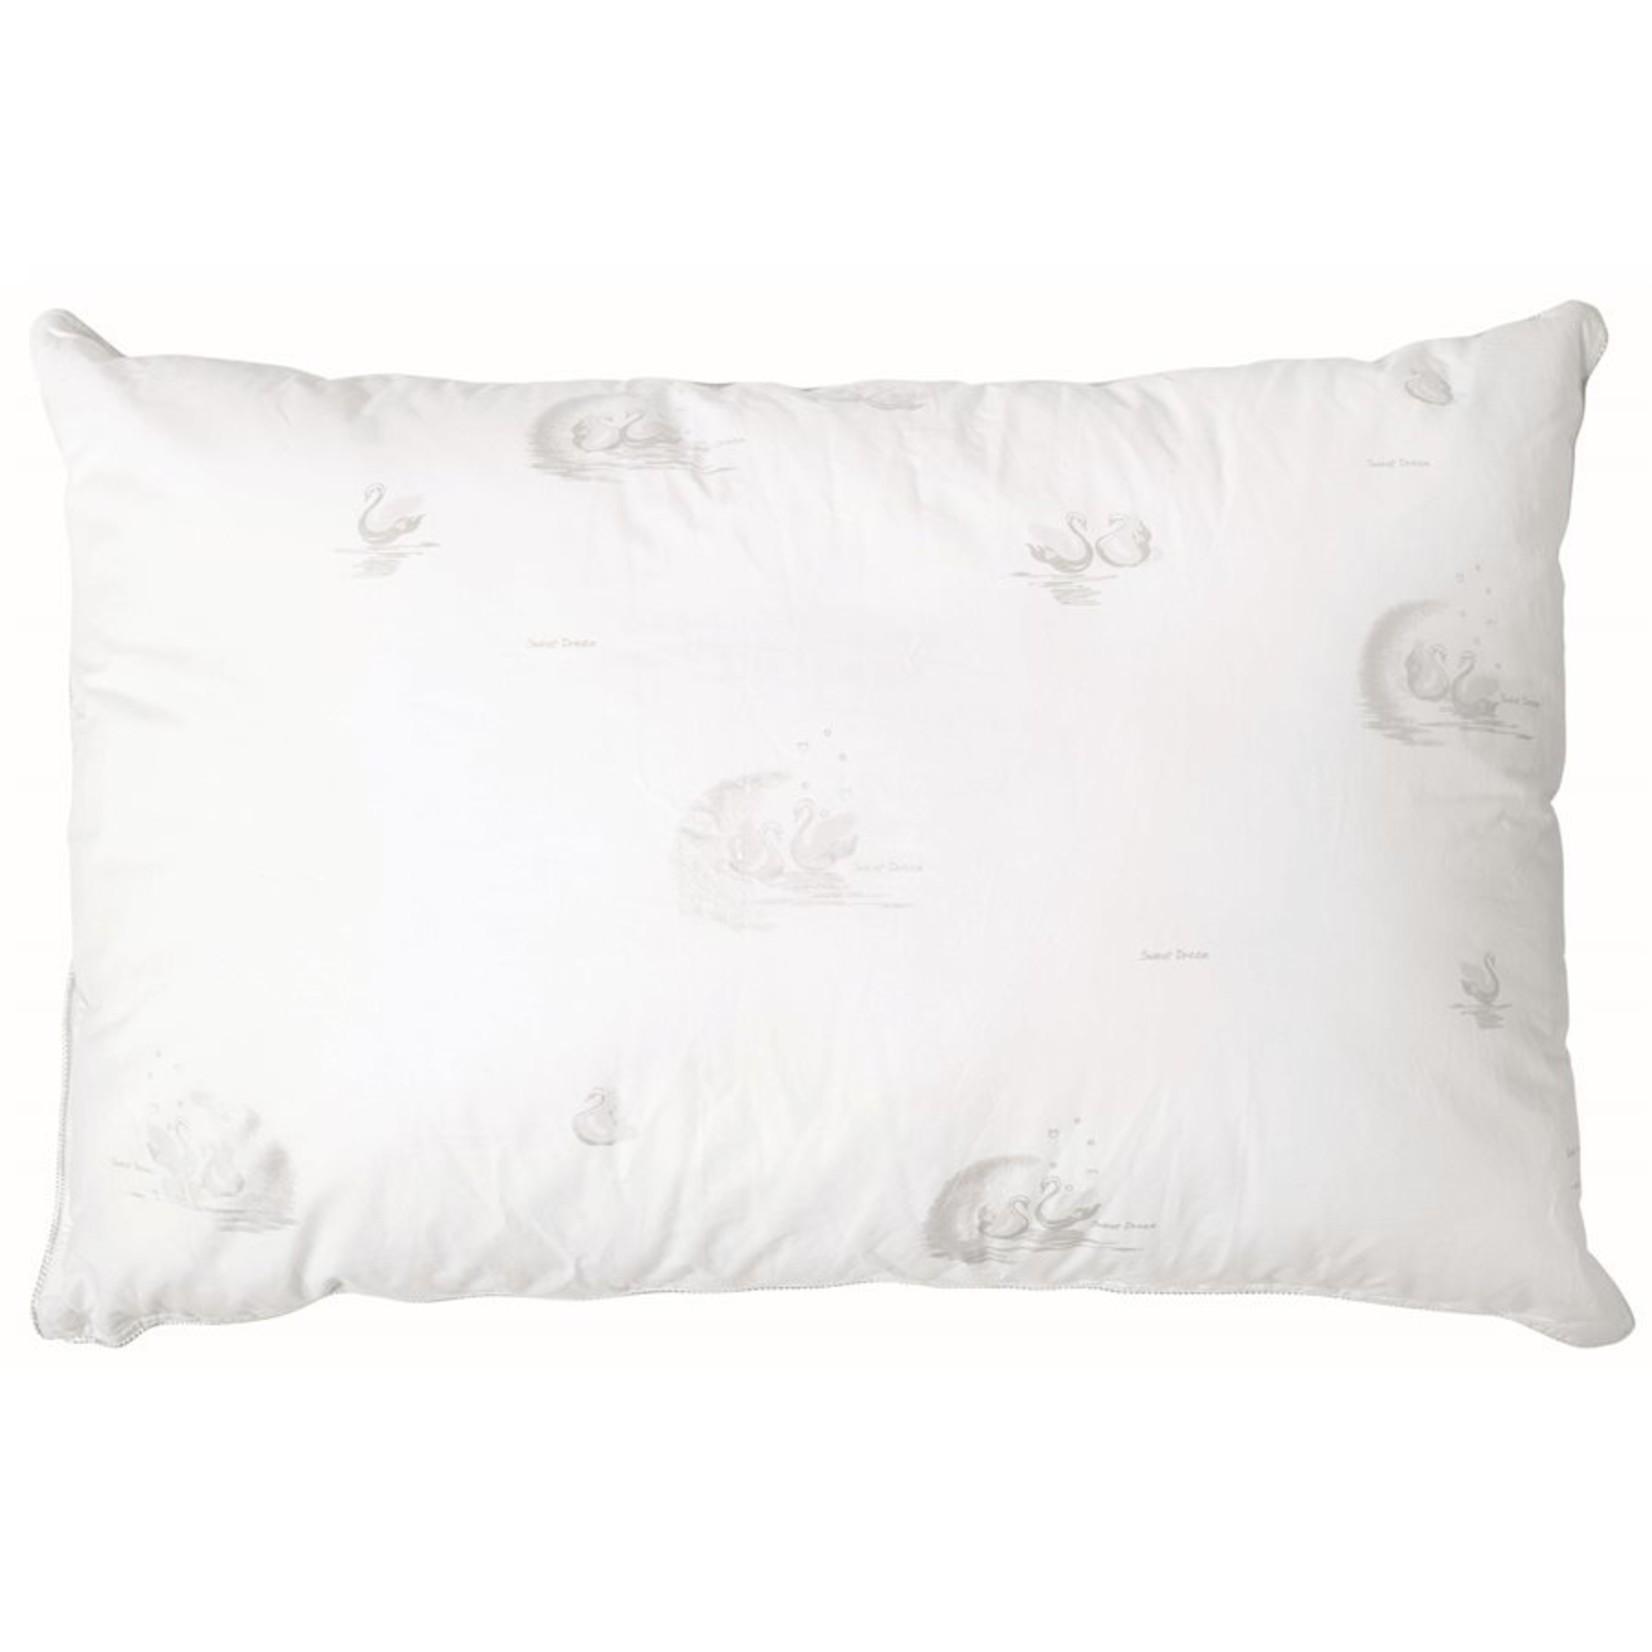 Brunelli Deluxe Microfiber Pillow